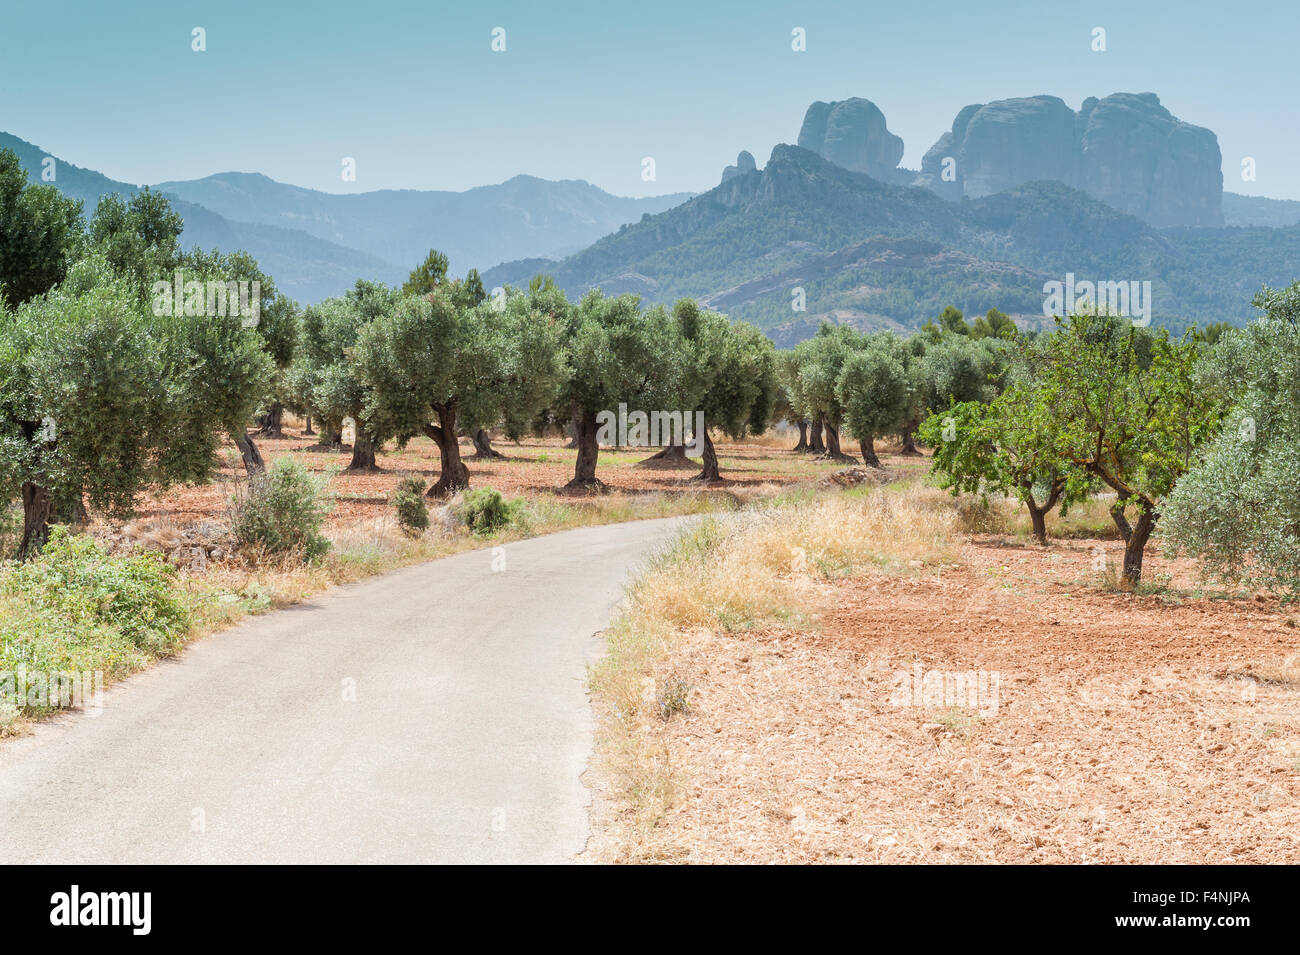 Les Roques de Benet peaks, Els Ports de Tortosa-Beseit Natural Park, near La Horta de Sant Joan, Spain - Stock Image